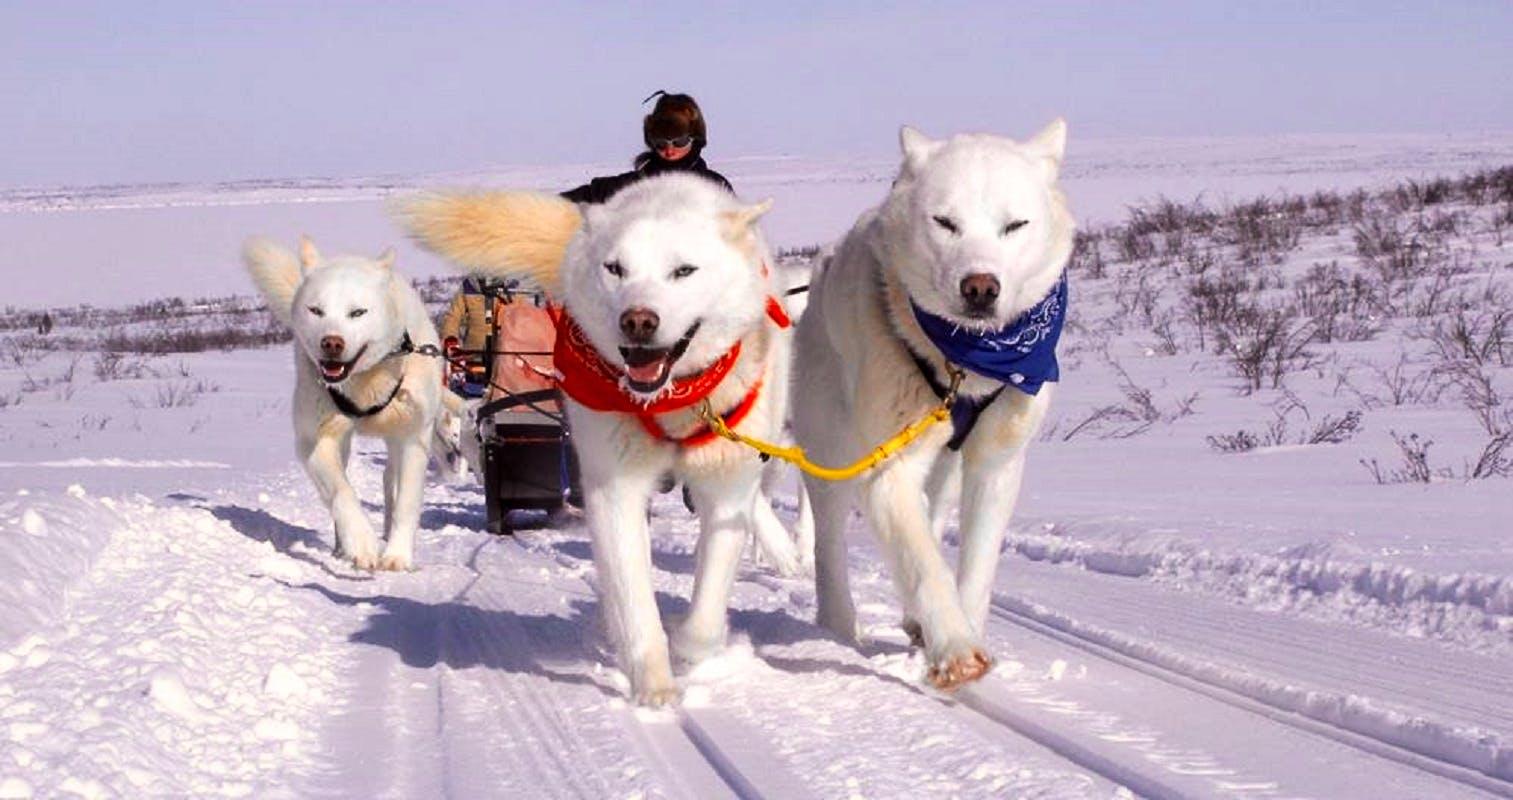 Arctic Huskies Caretaker and Dogsled Trainer